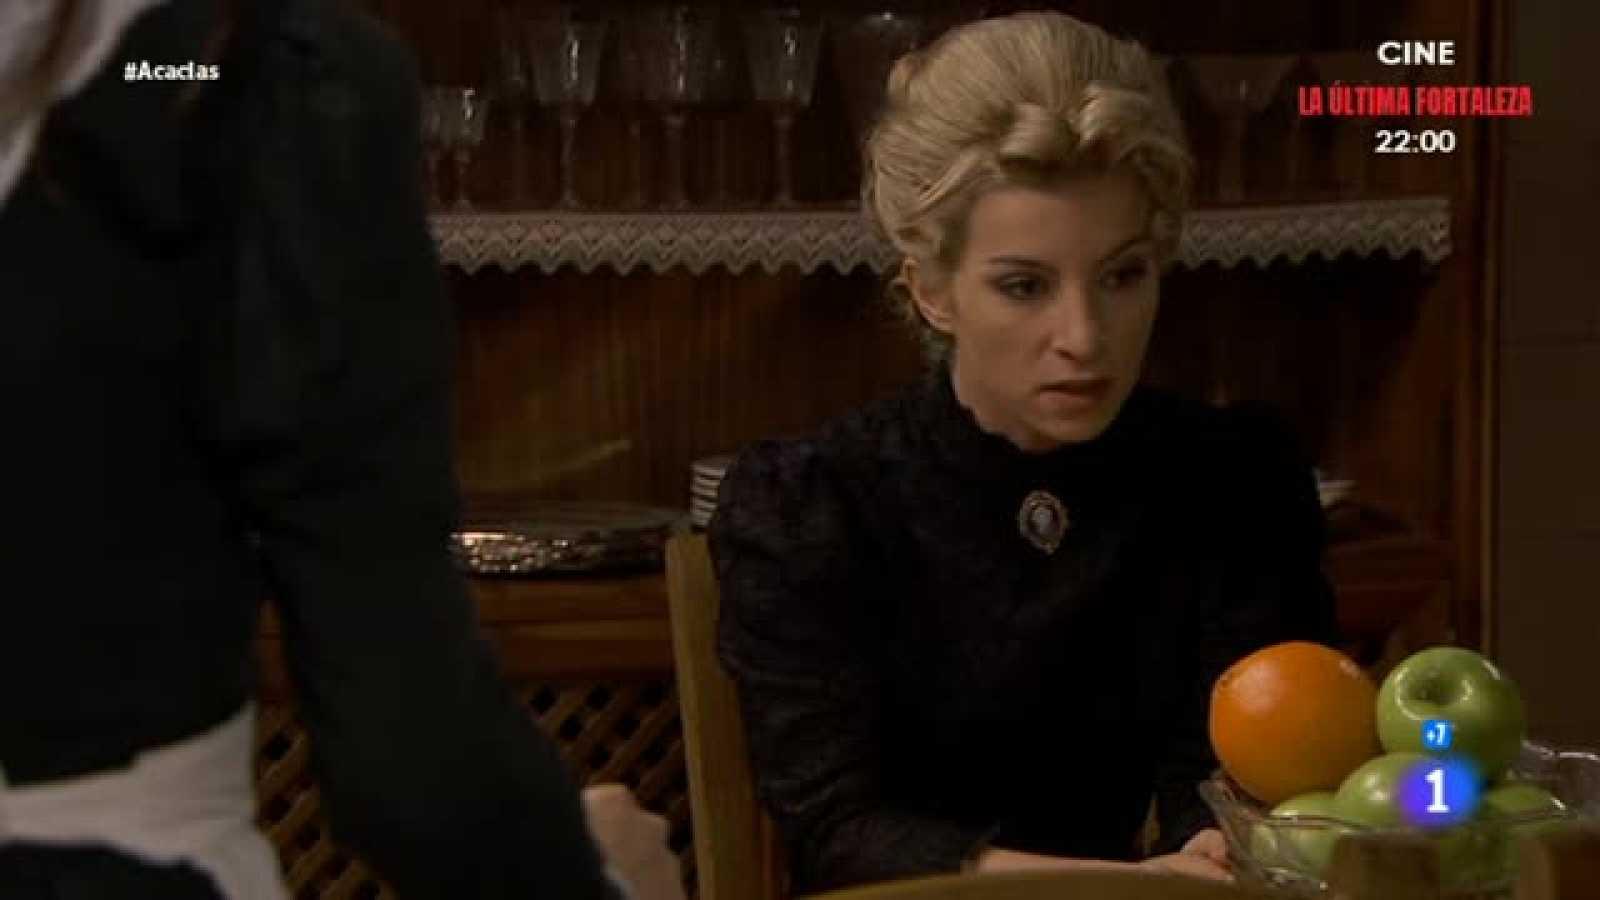 'Acacias 38' - Cayetana amenaza a Rita para que no cuente lo que sabe